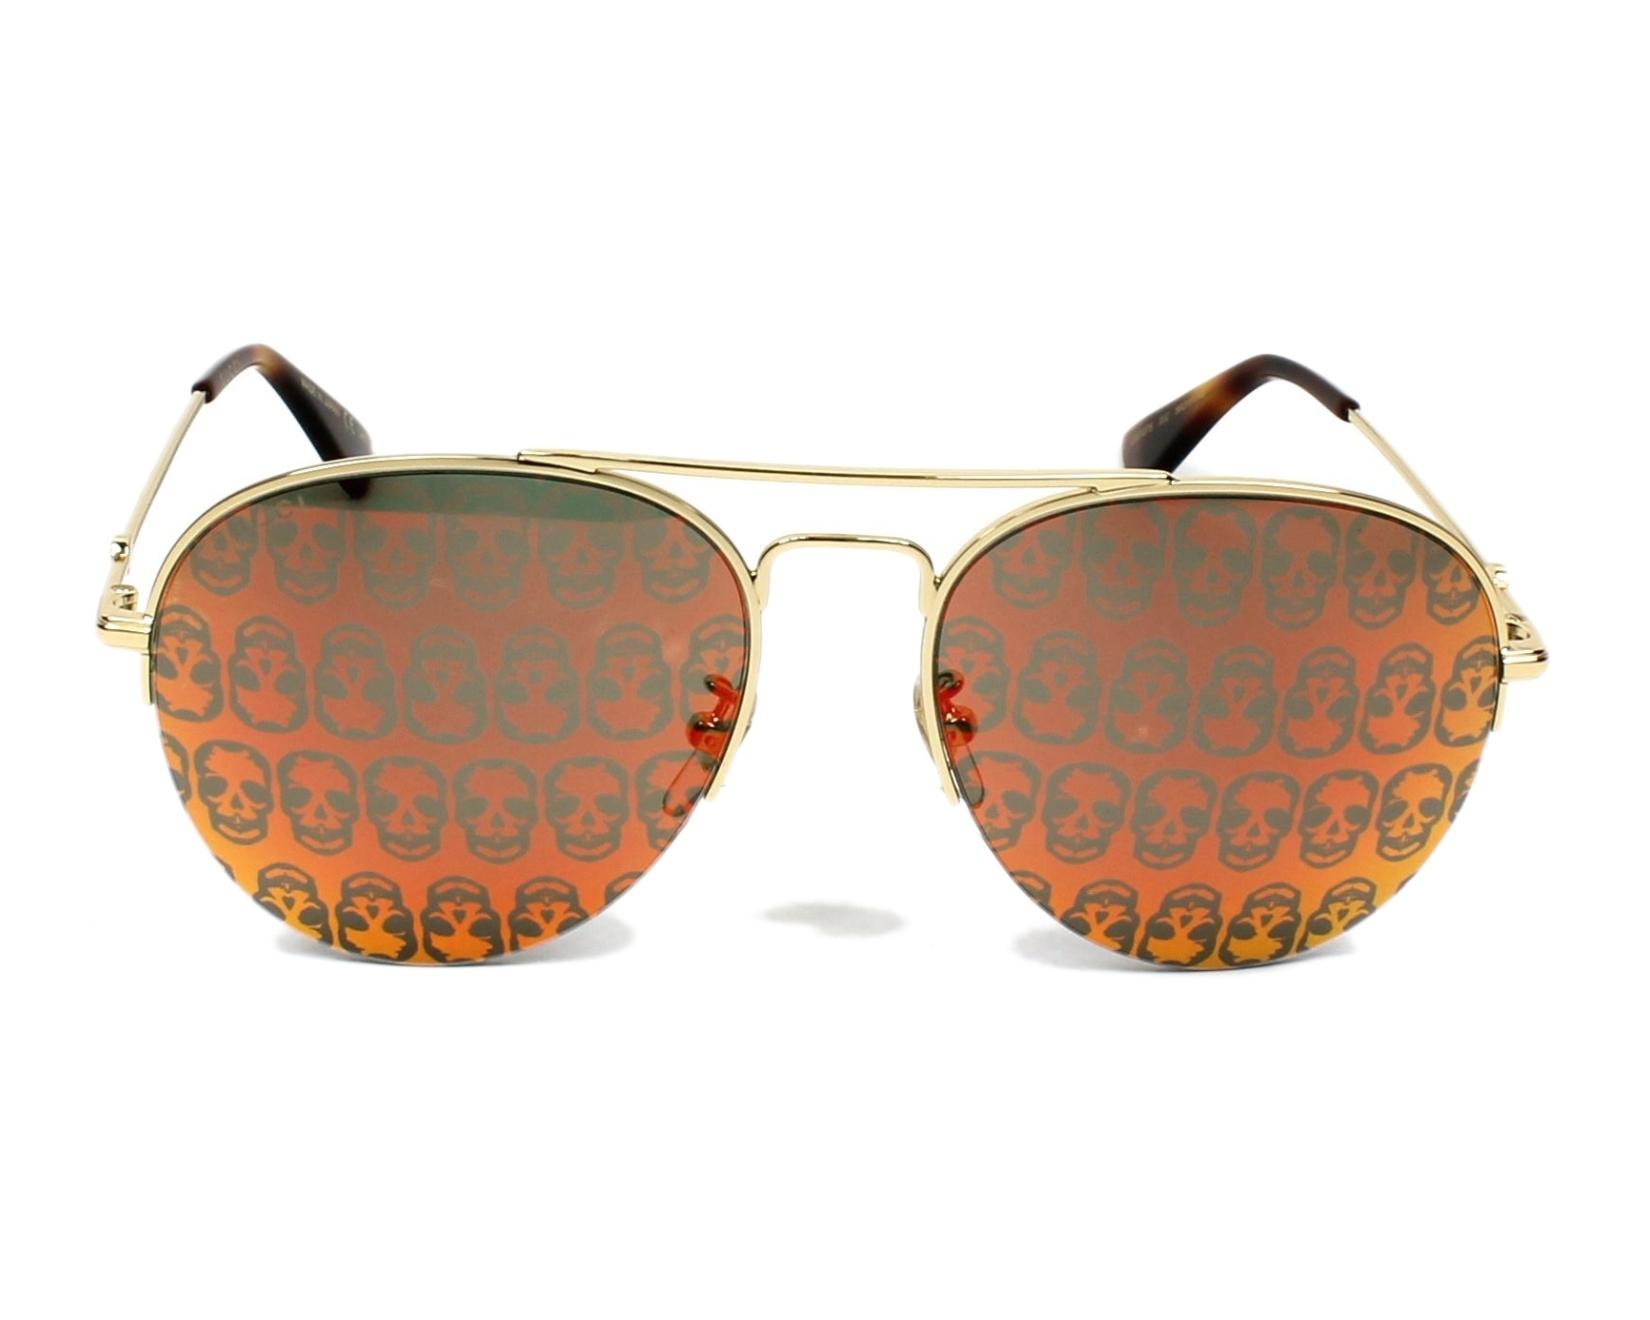 c4975515f9ba Sunglasses Gucci GG-0107-S 002 - Gold front view